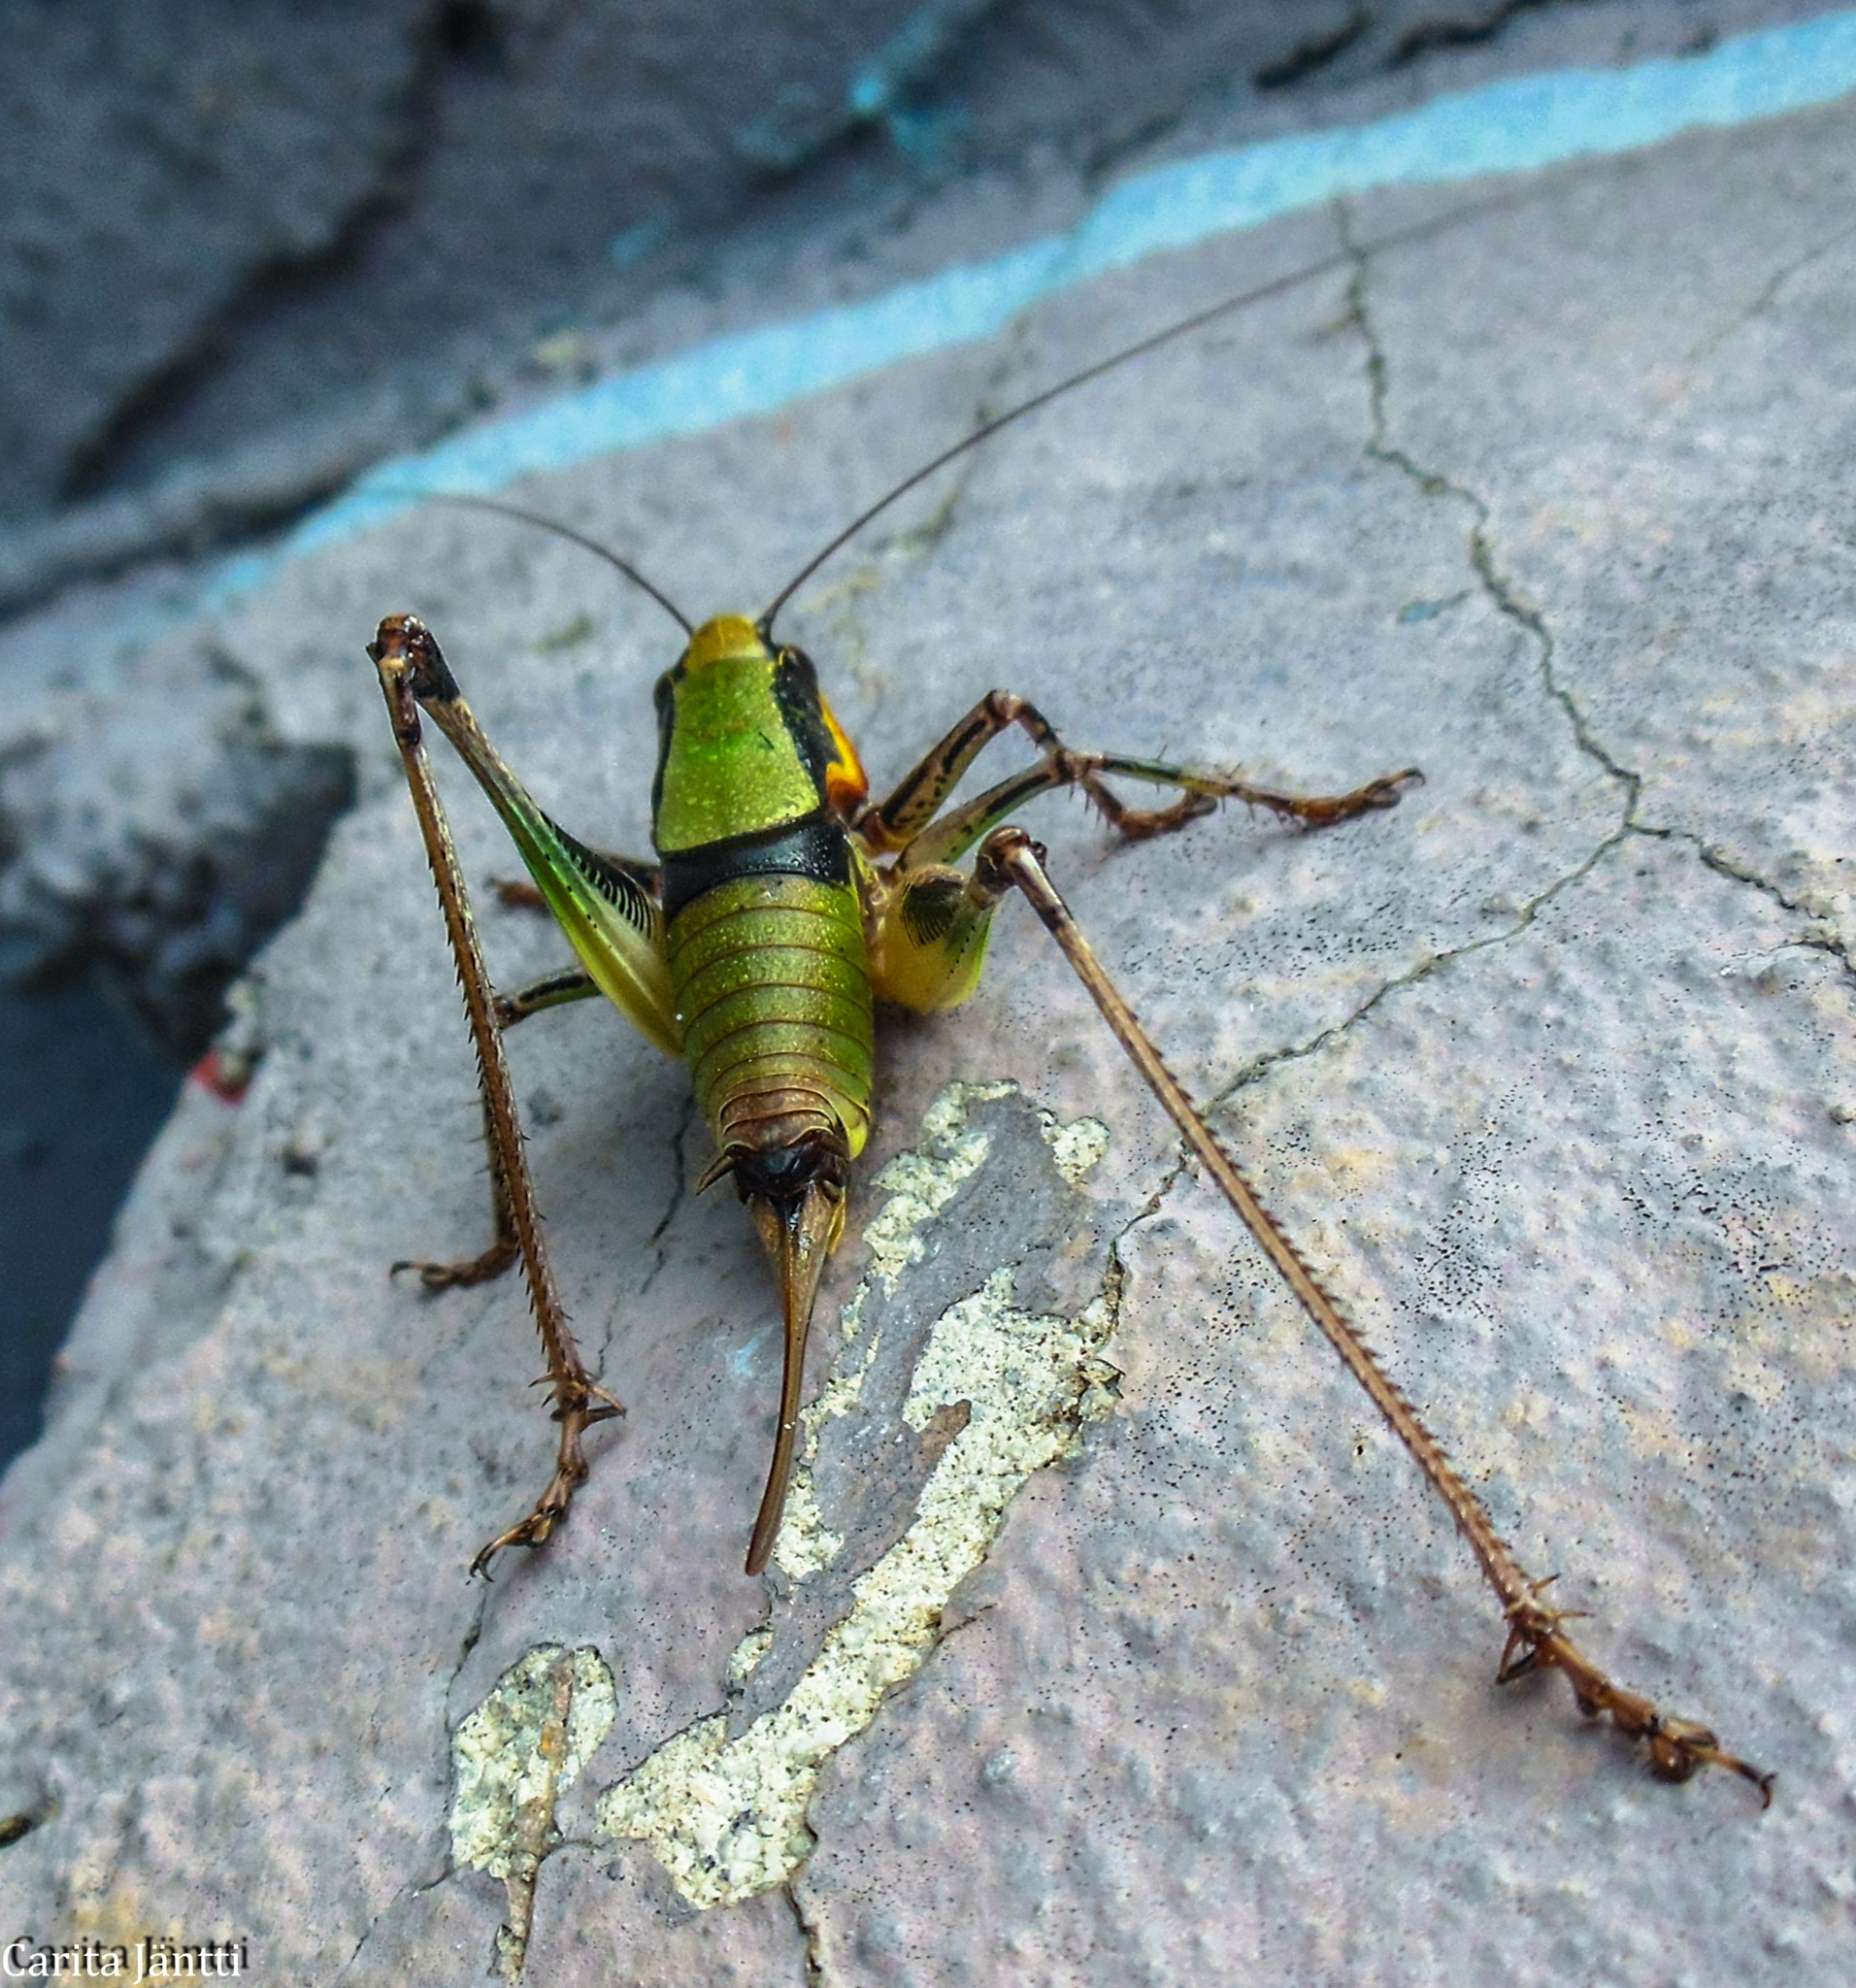 Grasshopper by Carita Jäntti